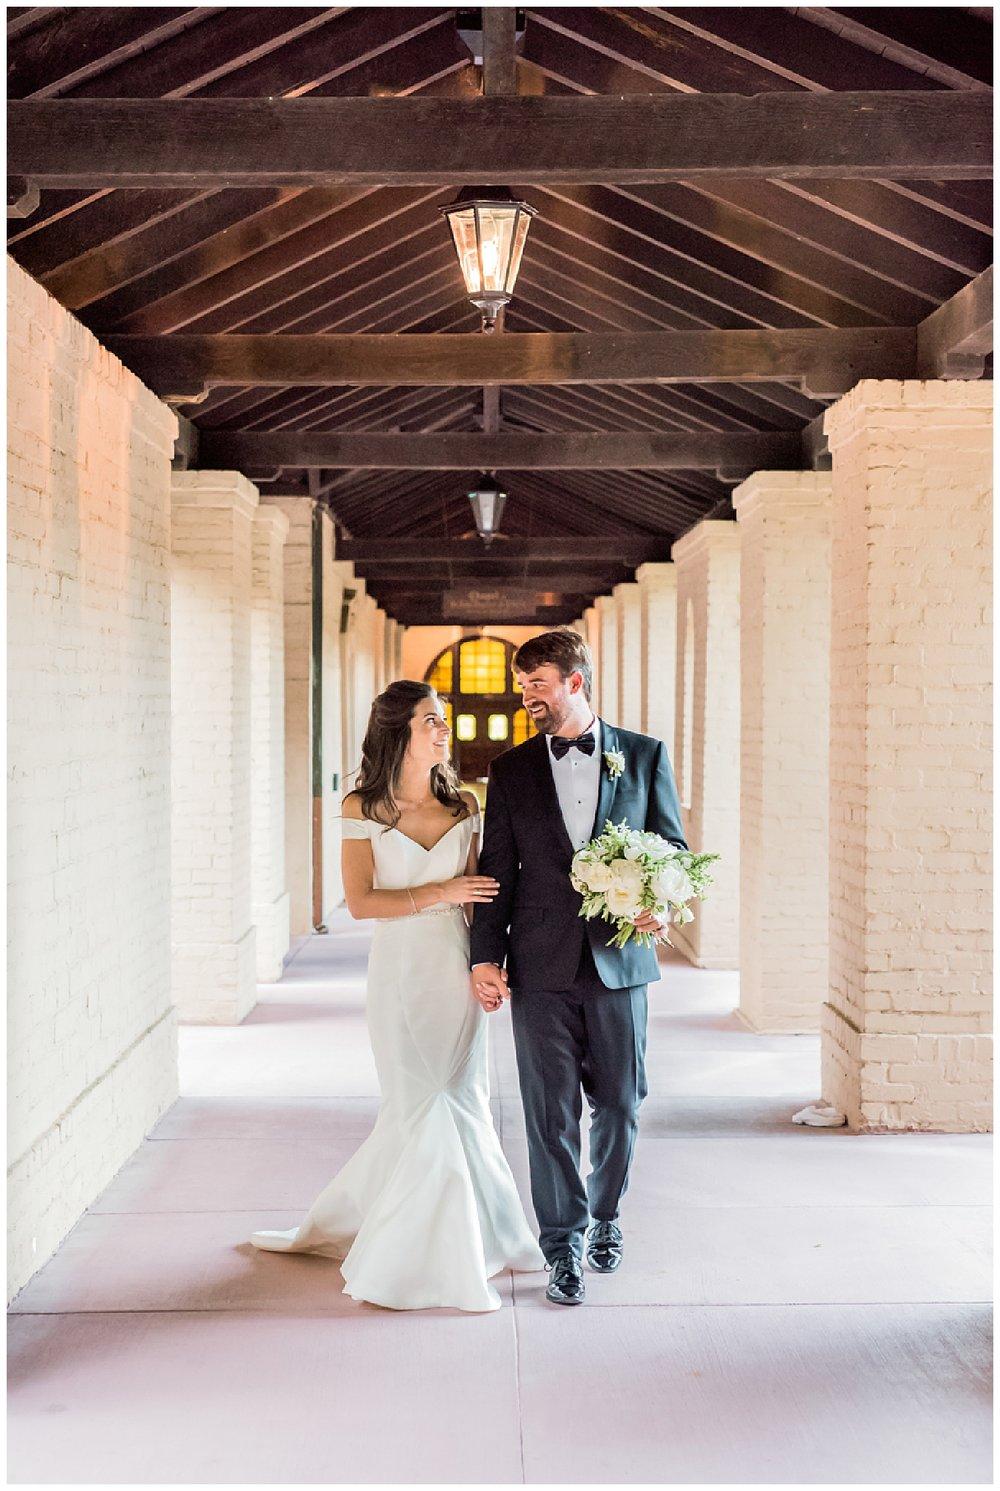 Janine_Licare_Photography_San_Francisco_Wedding_Photographer_0144.jpg